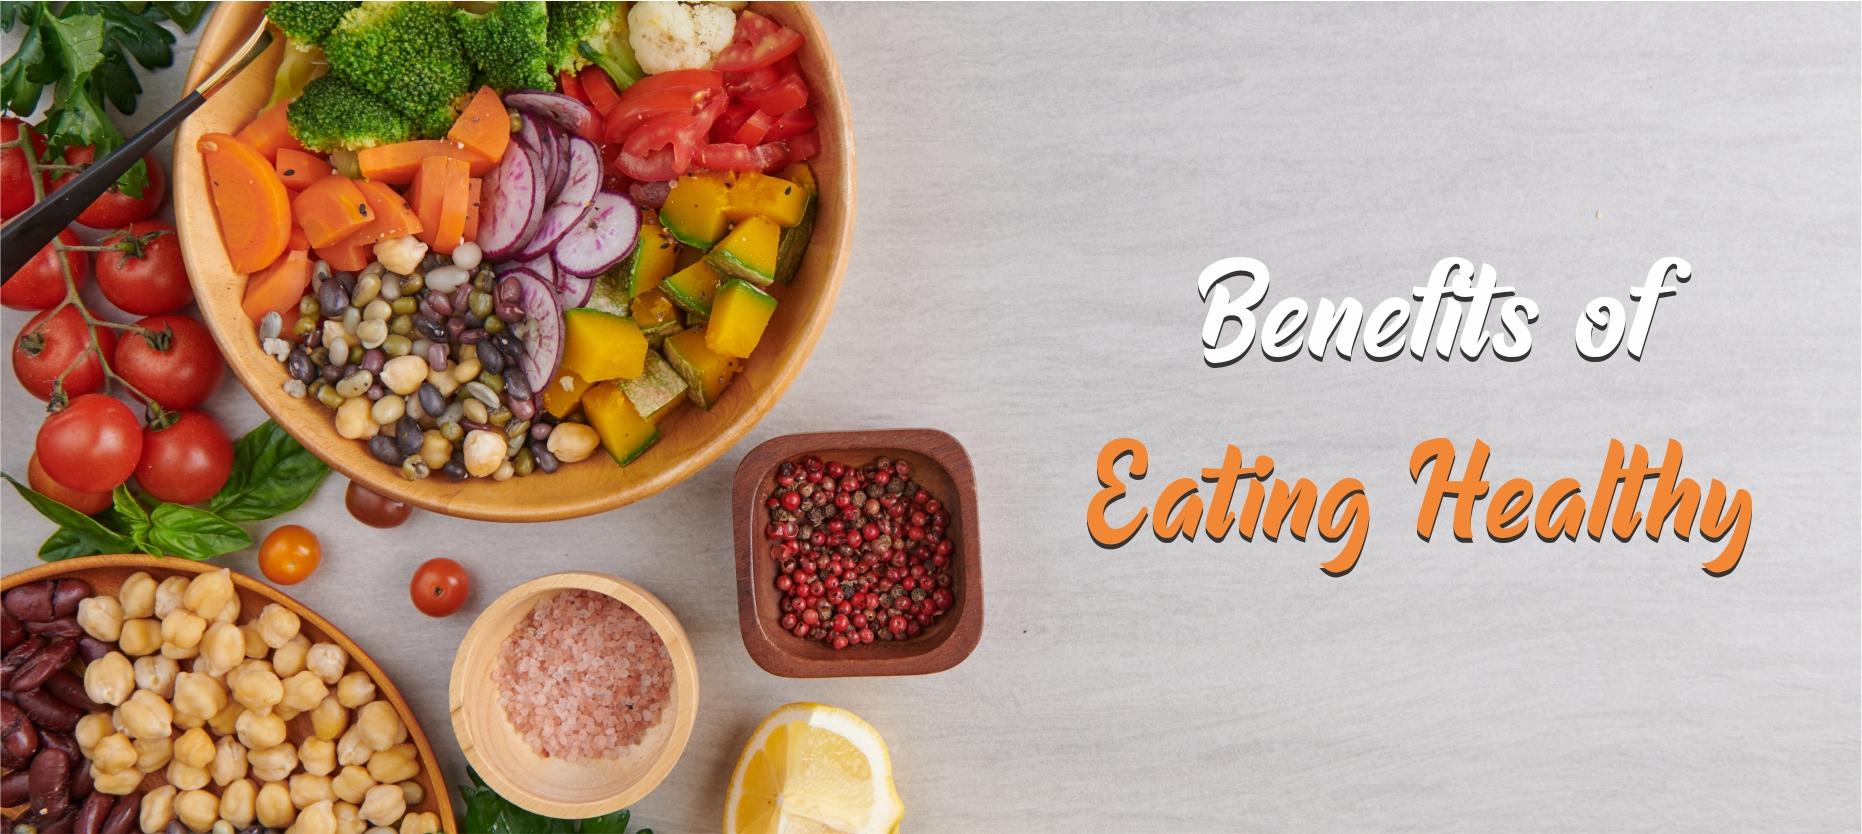 10 Benefits of Eating Healthy Food